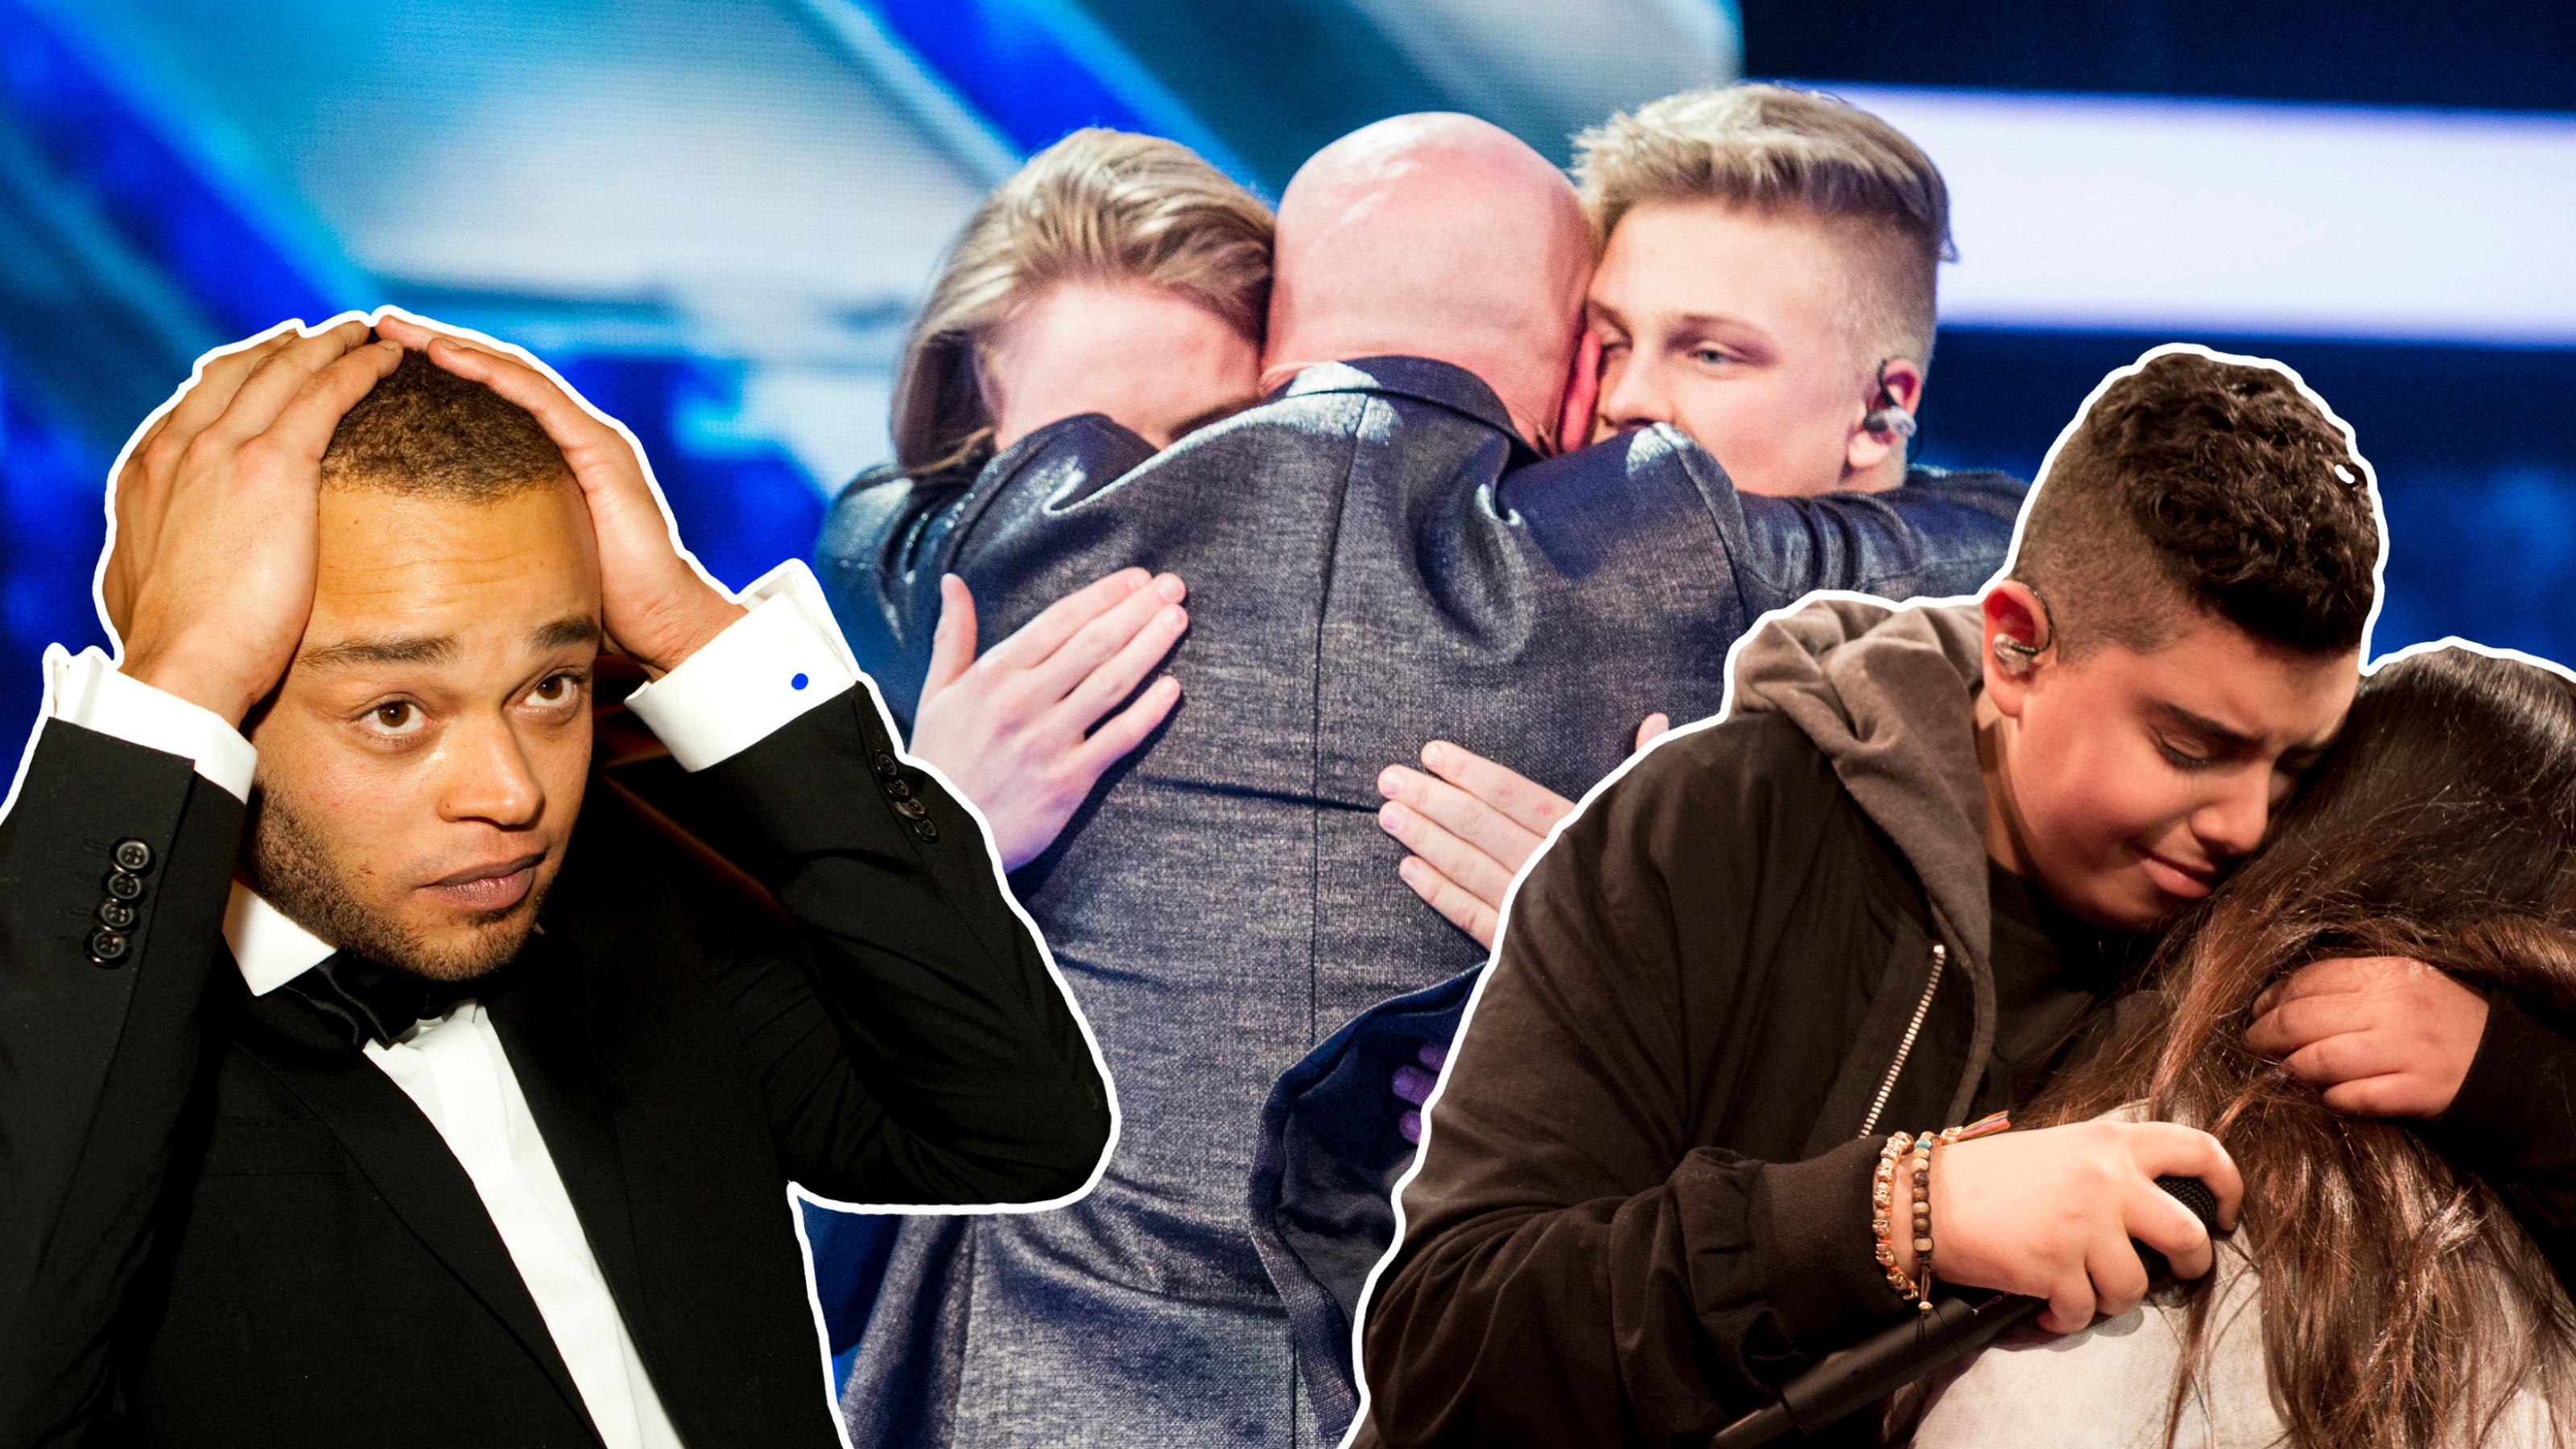 Citybois exit X Factor 2015